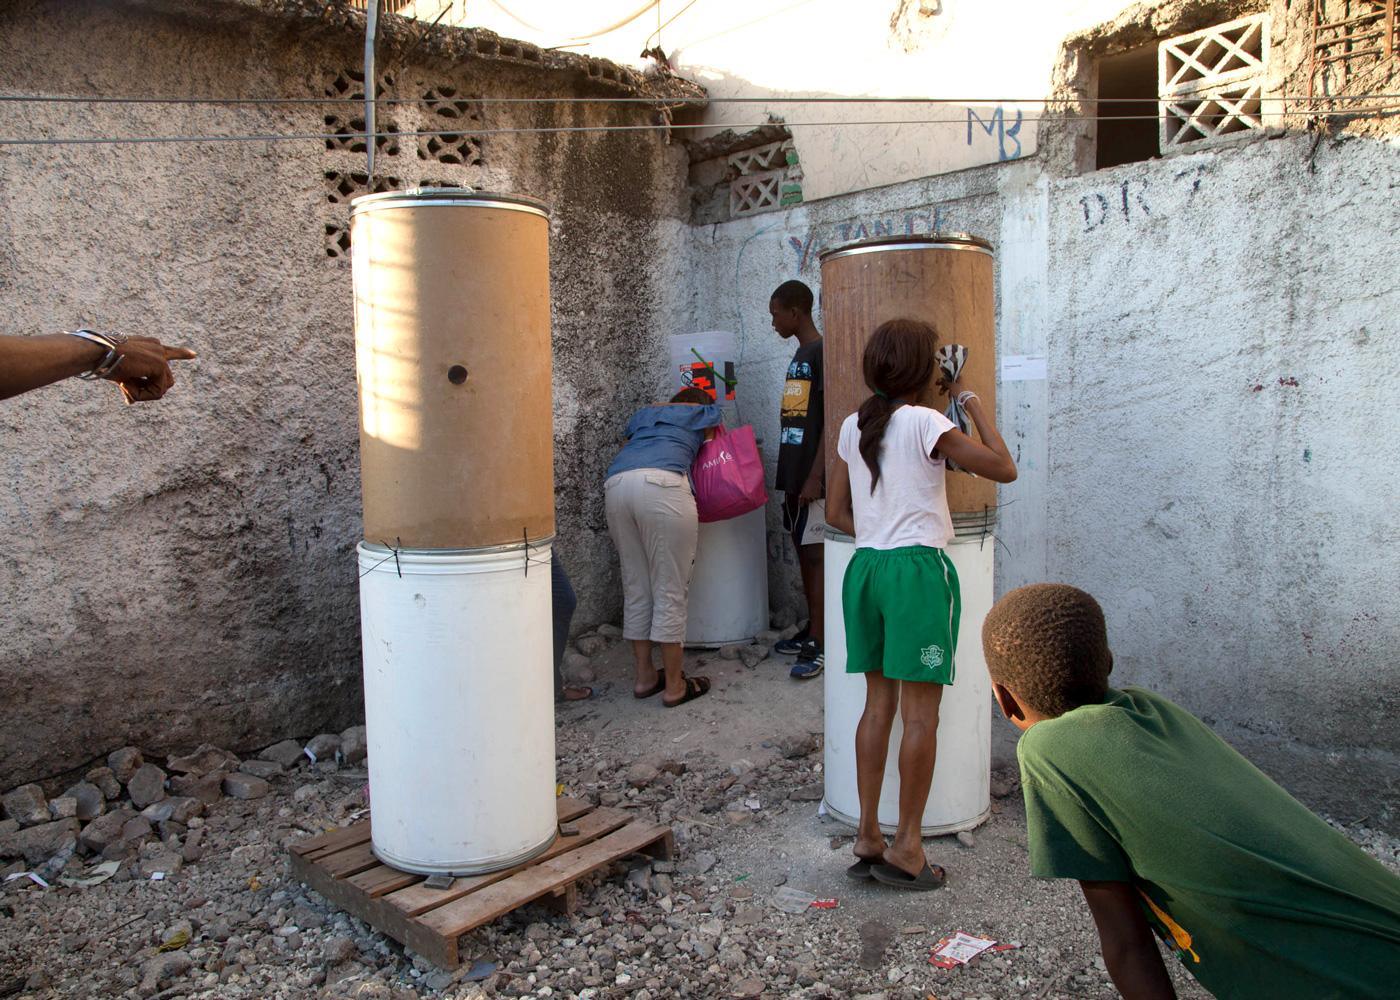 - Ghetto BiennalePort-Au-Prince, HaitiDecember 2017